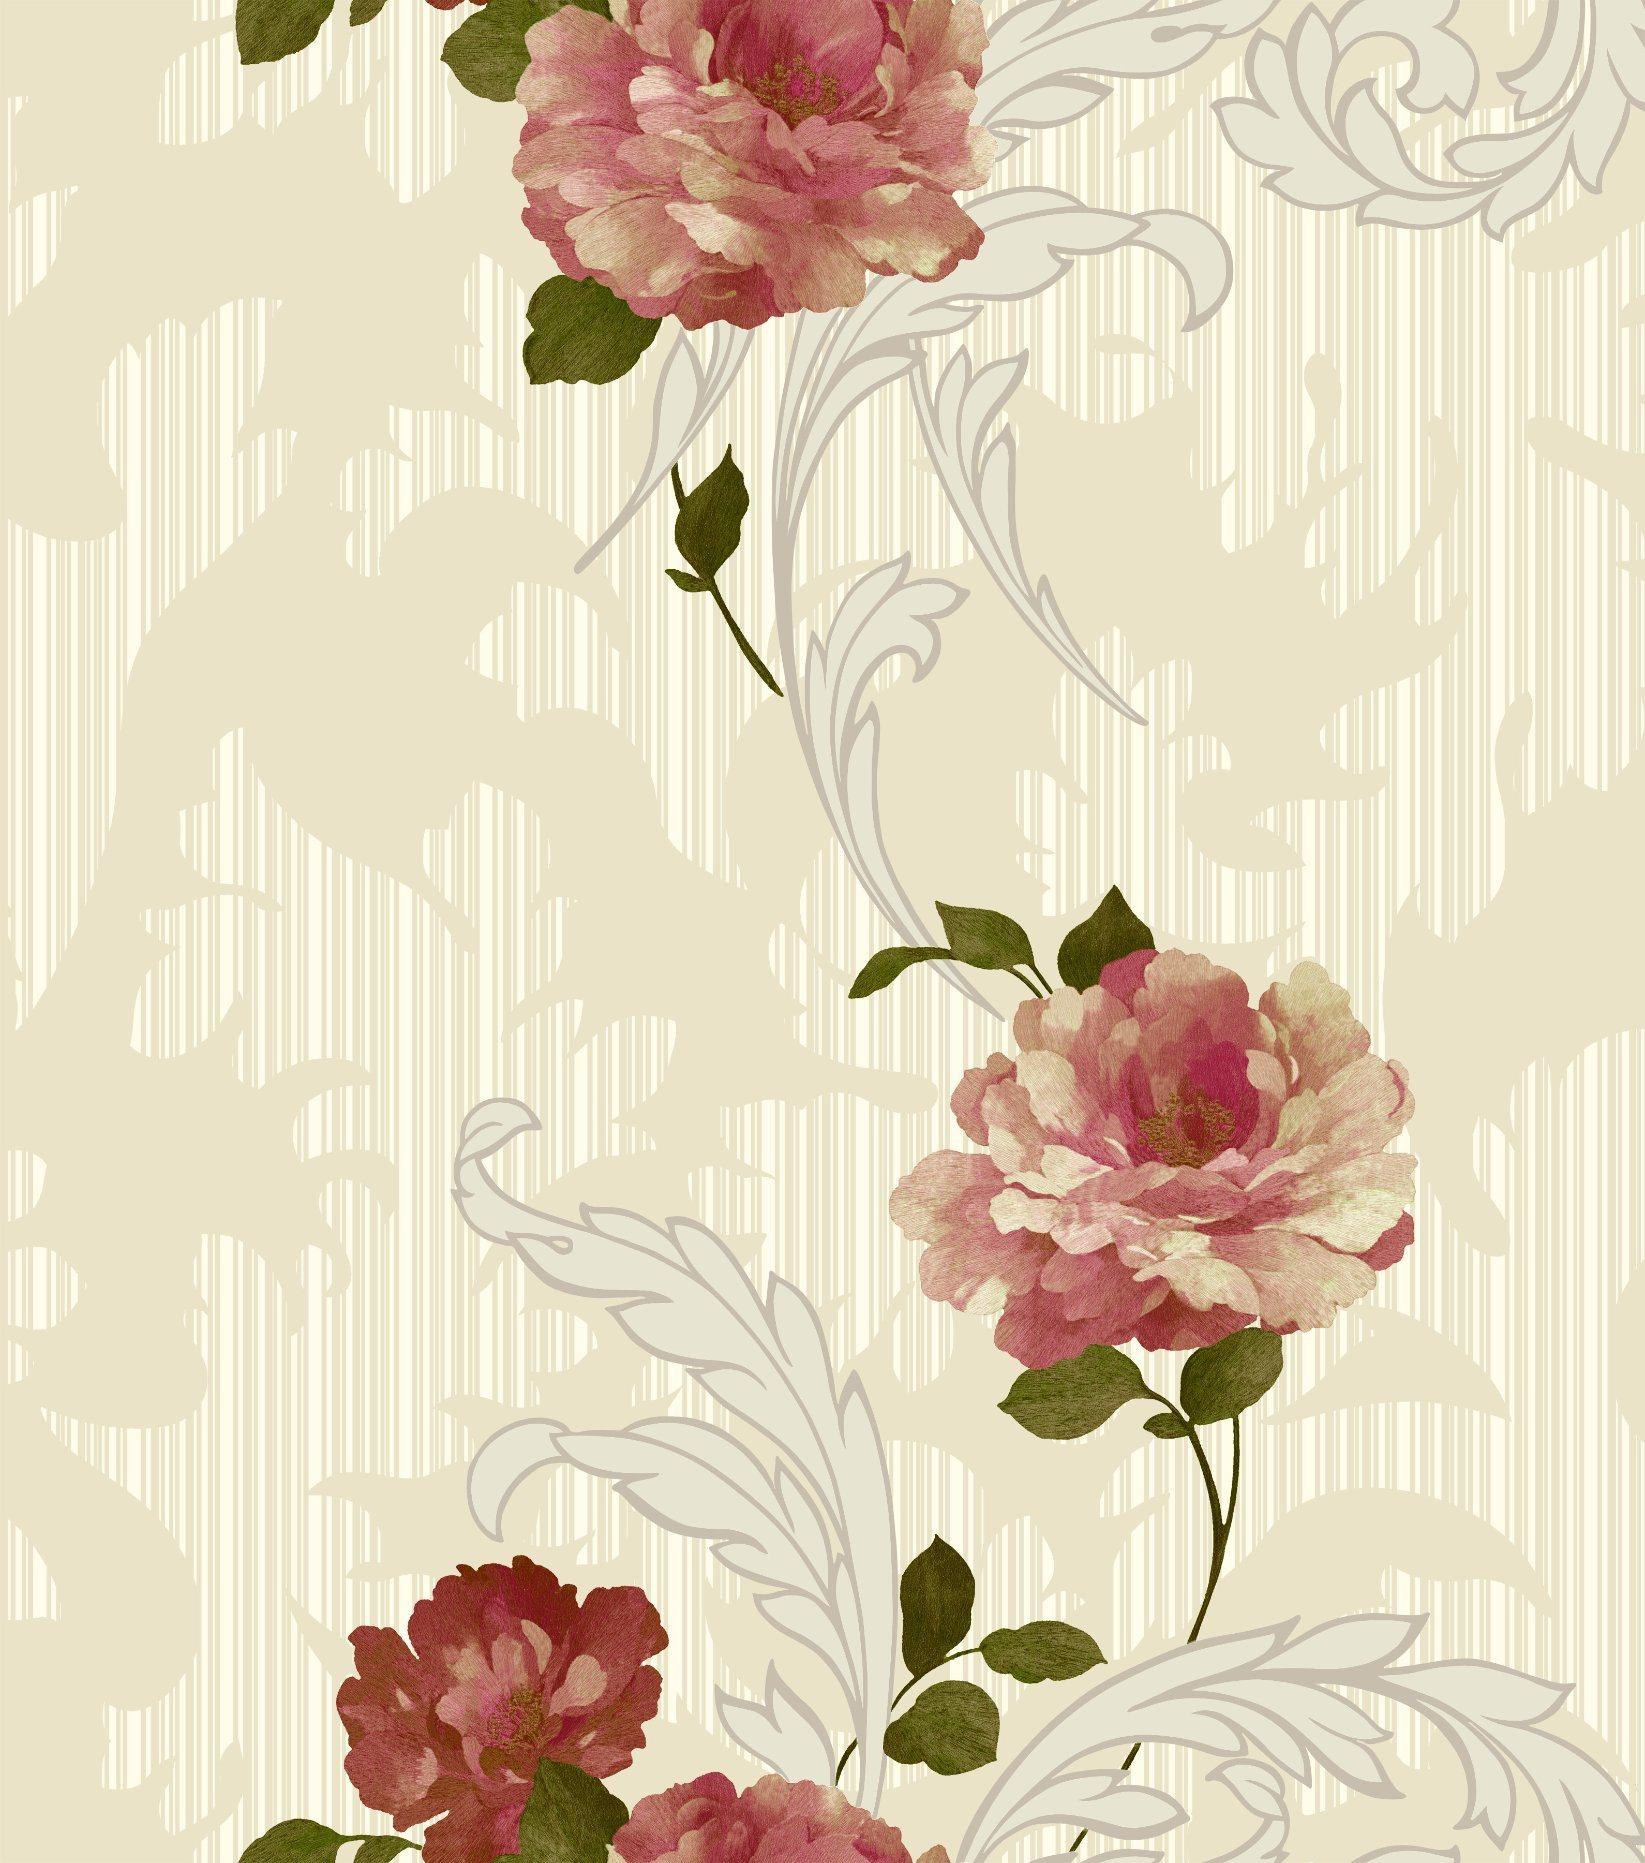 Interior Design Vinyl 3D Flower Wallpaper for Home Decoration